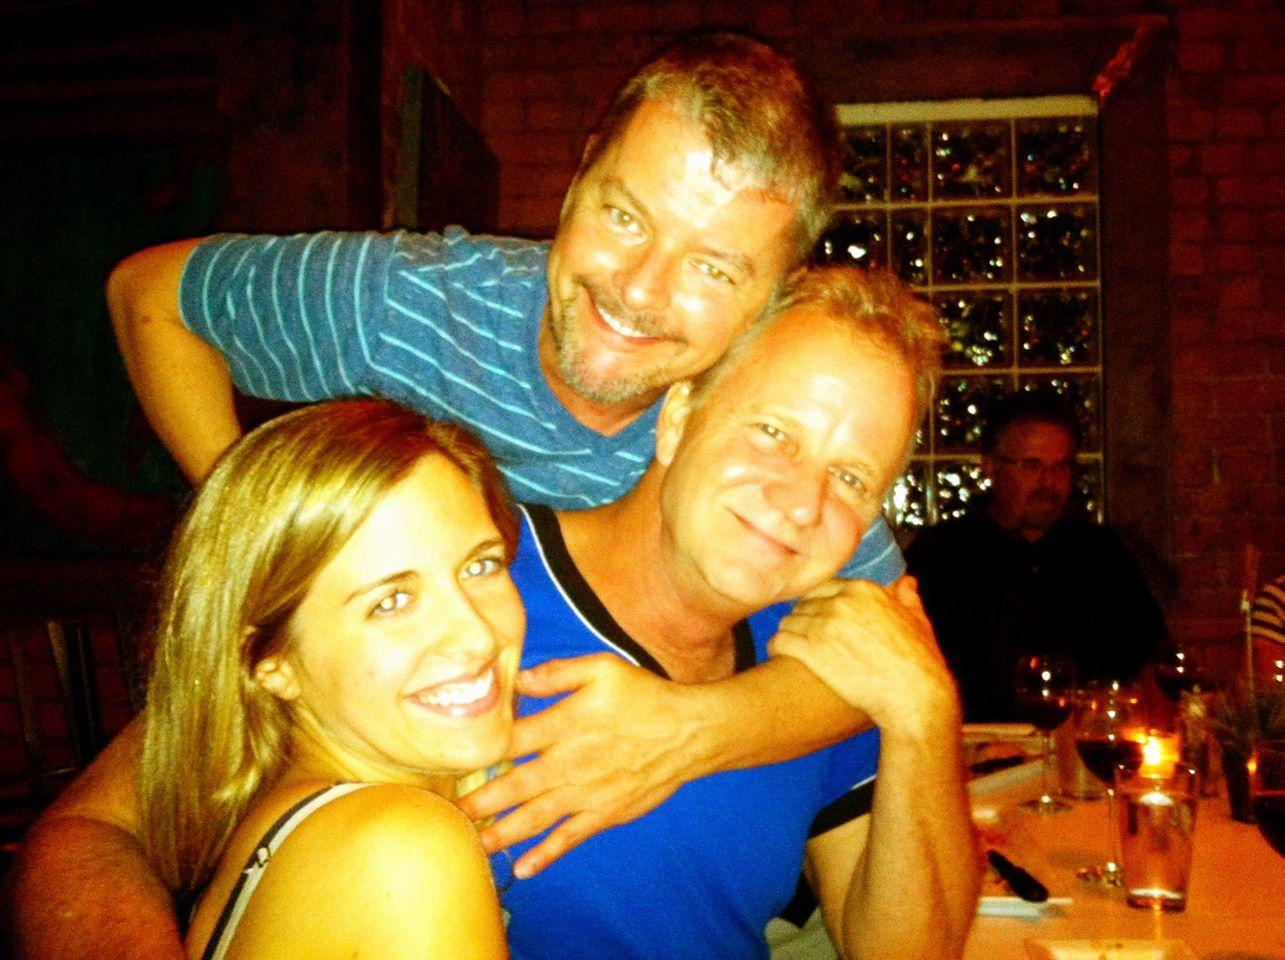 Julia Alexandra, Eric Chapman and David Weiss enjoy dinner. (Photo credit needed)